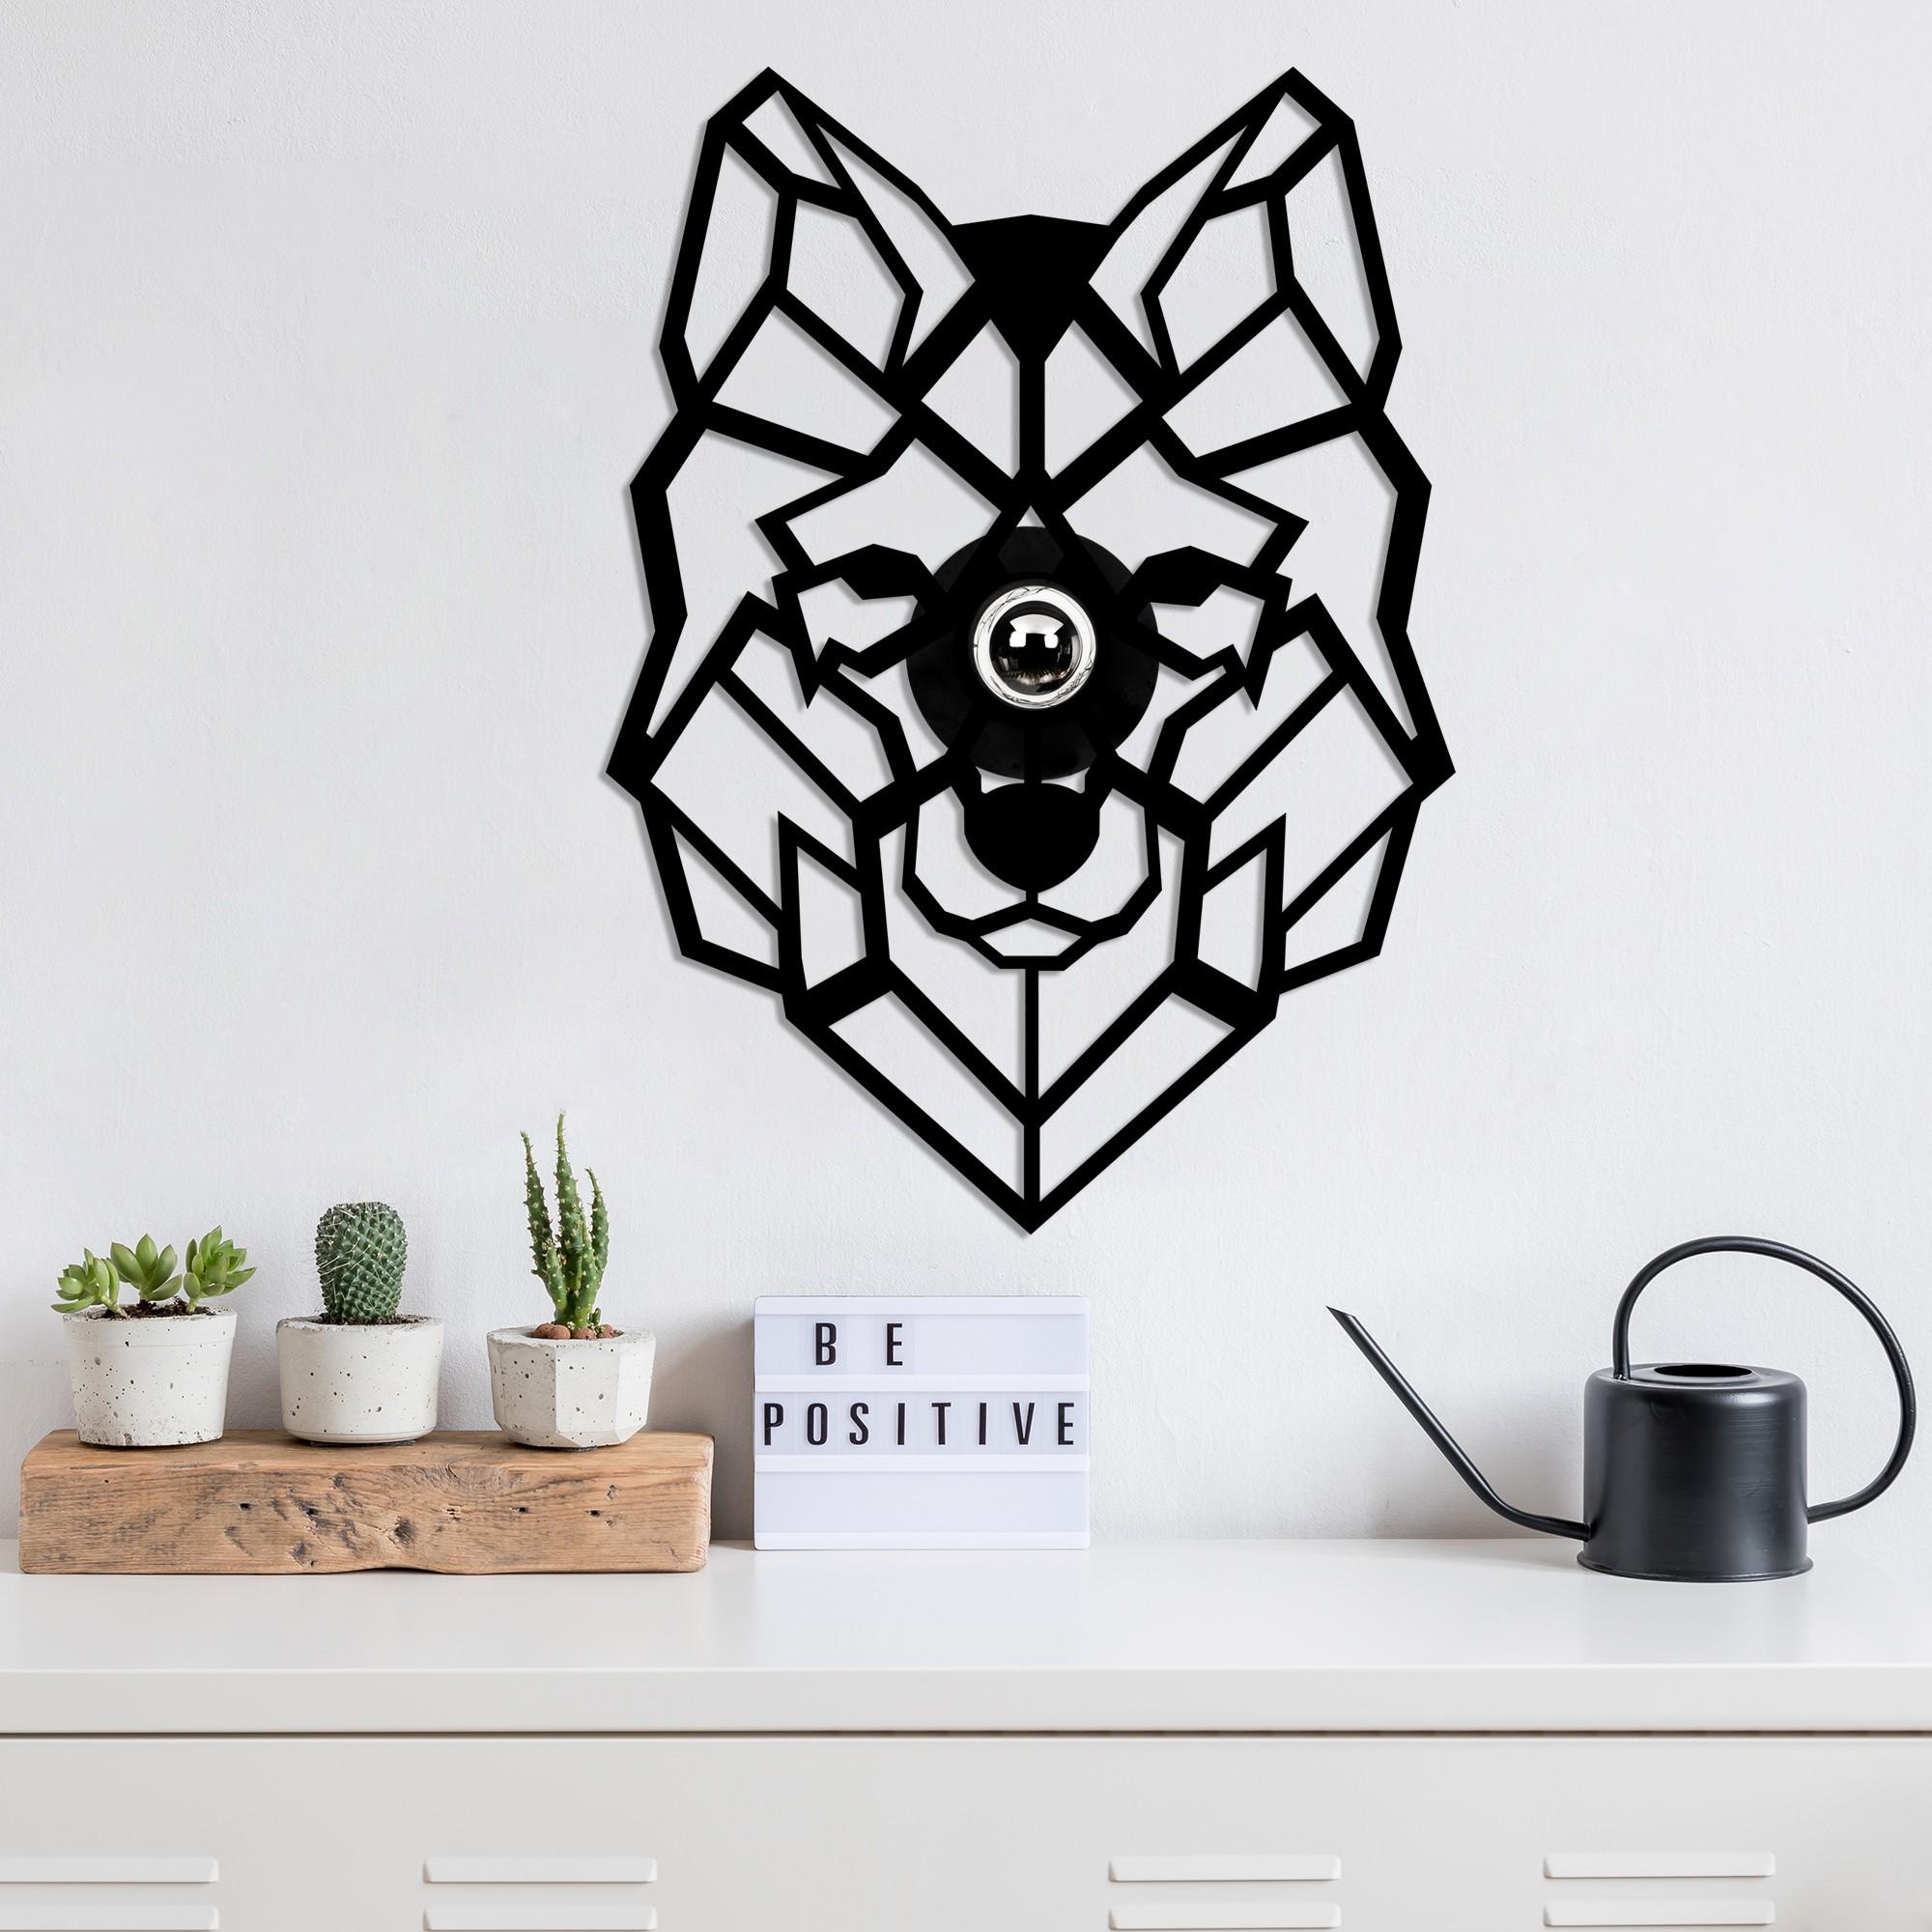 LED industriële wanddeco lamp dieren - Wolf - dimbaar - E27 fitting - sfeerfoto